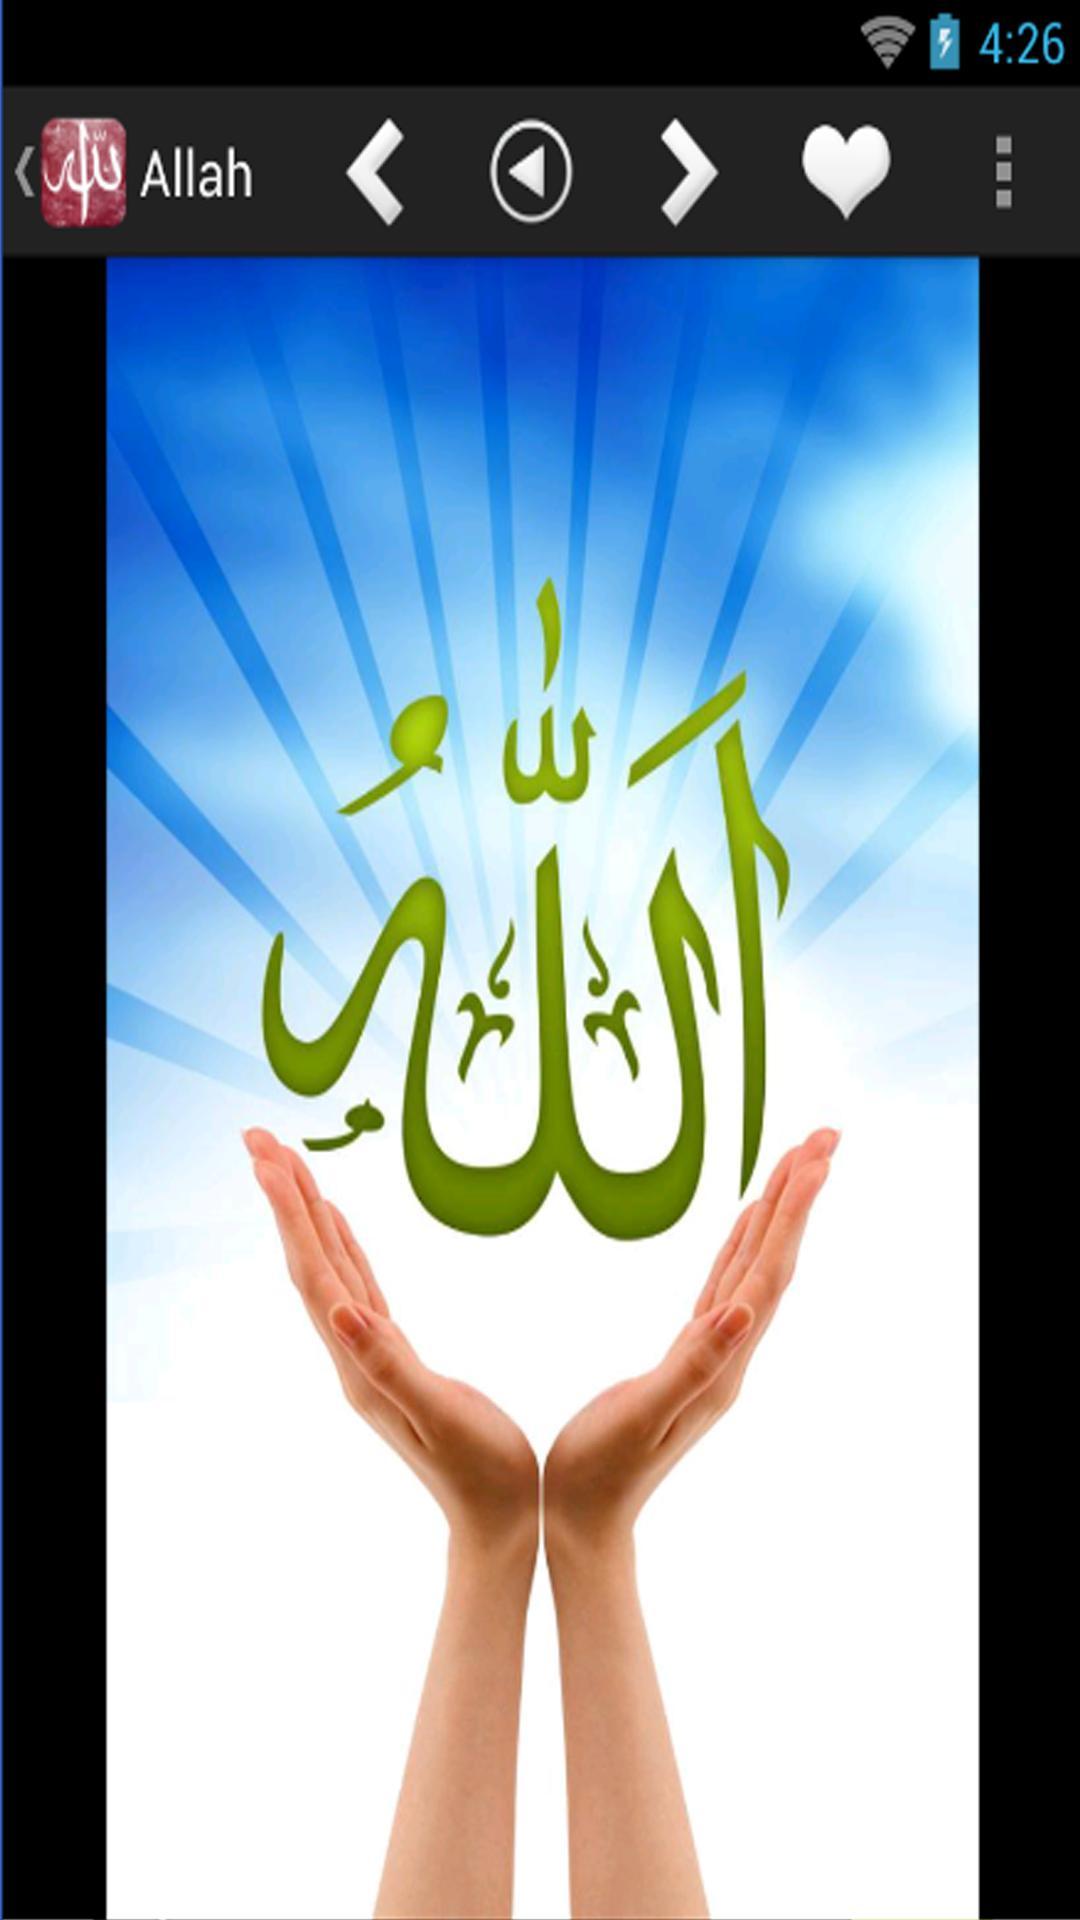 Allah Islam Fond D Ecran Hd For Android Apk Download